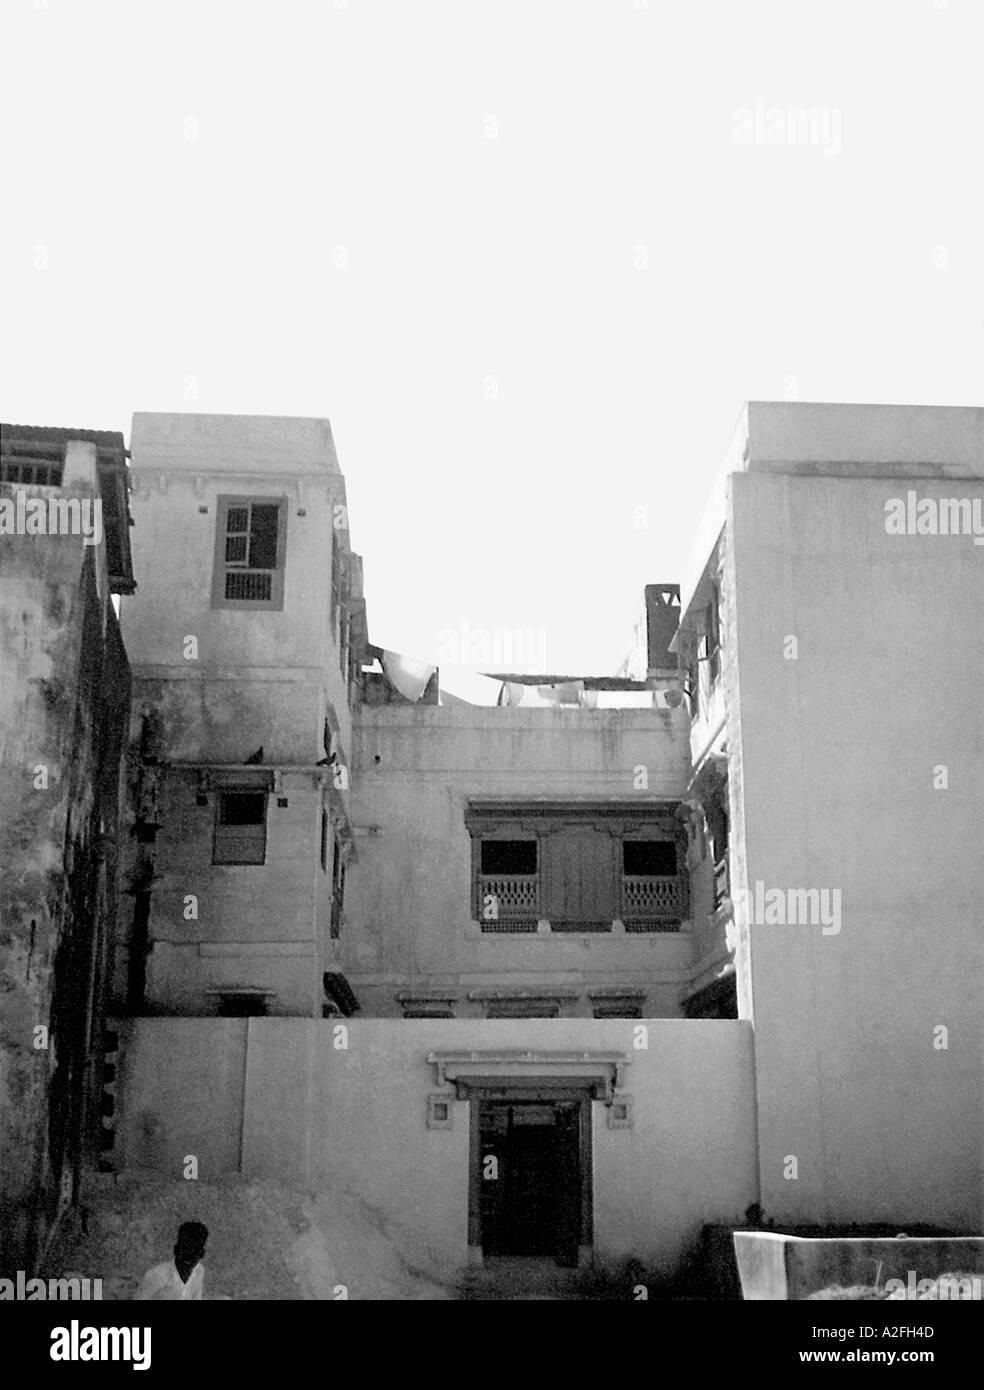 Il Mahatma Gandhi casa natale a Porbandar Gujarat India Immagini Stock